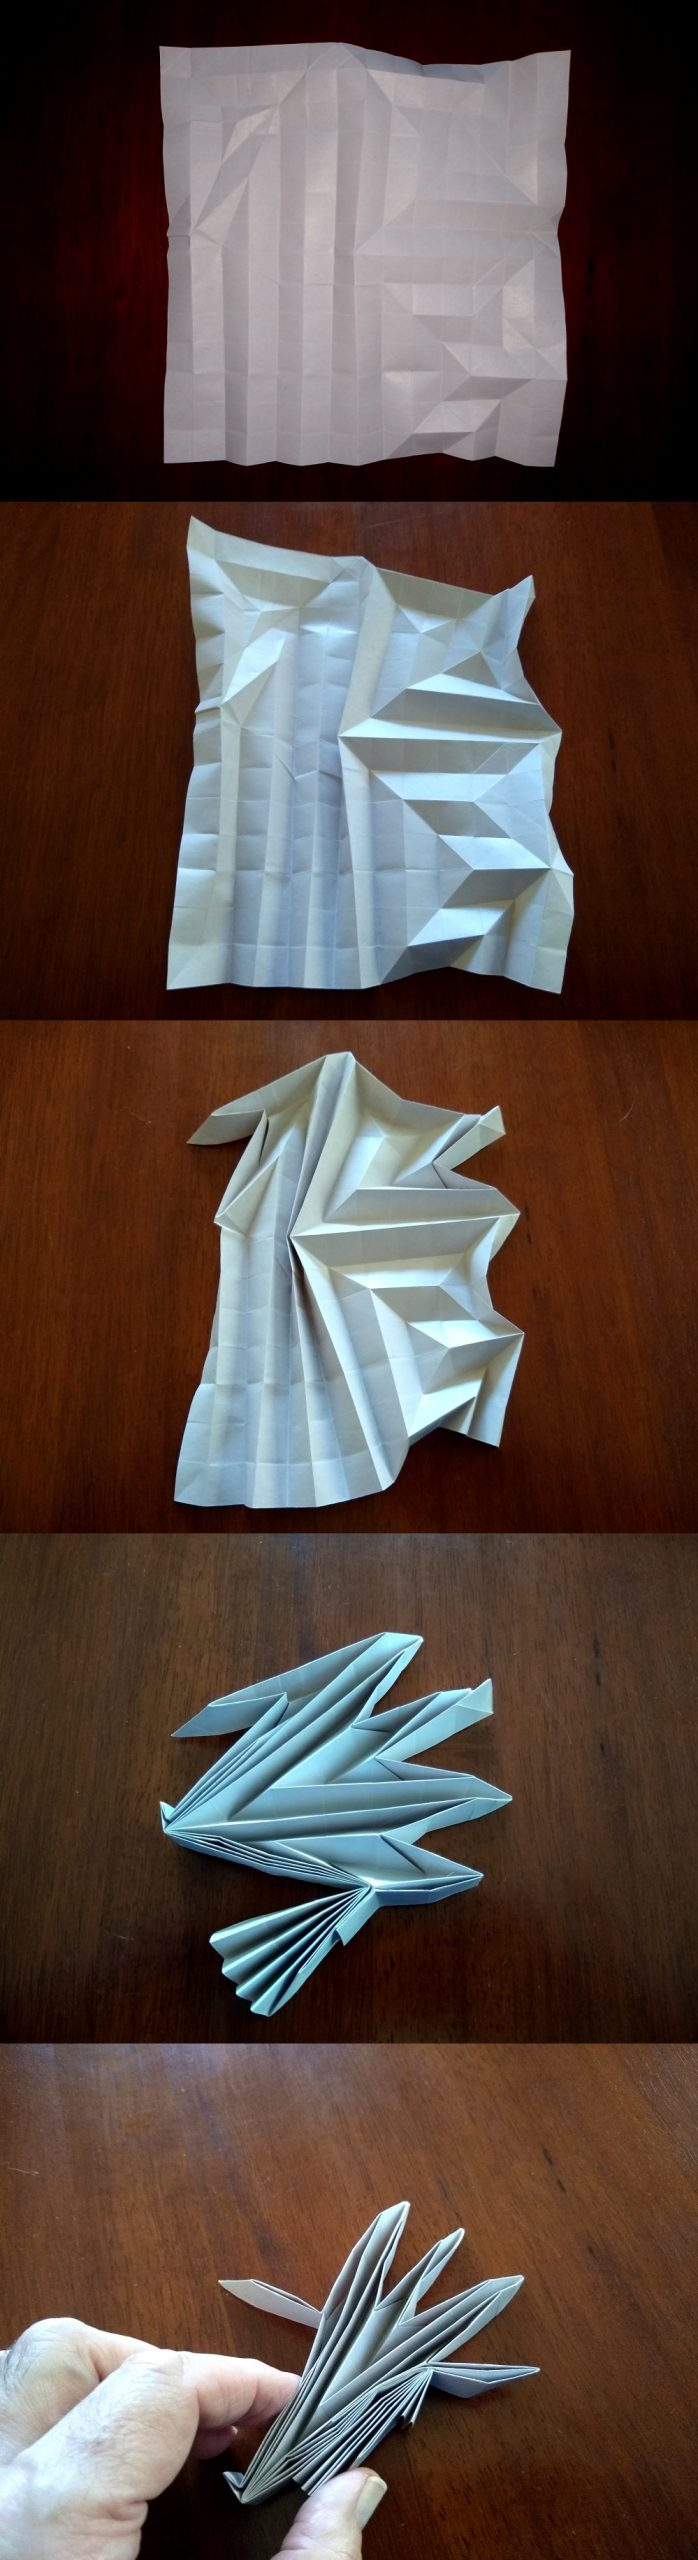 Sergio Gurachi's Skeleton hand development